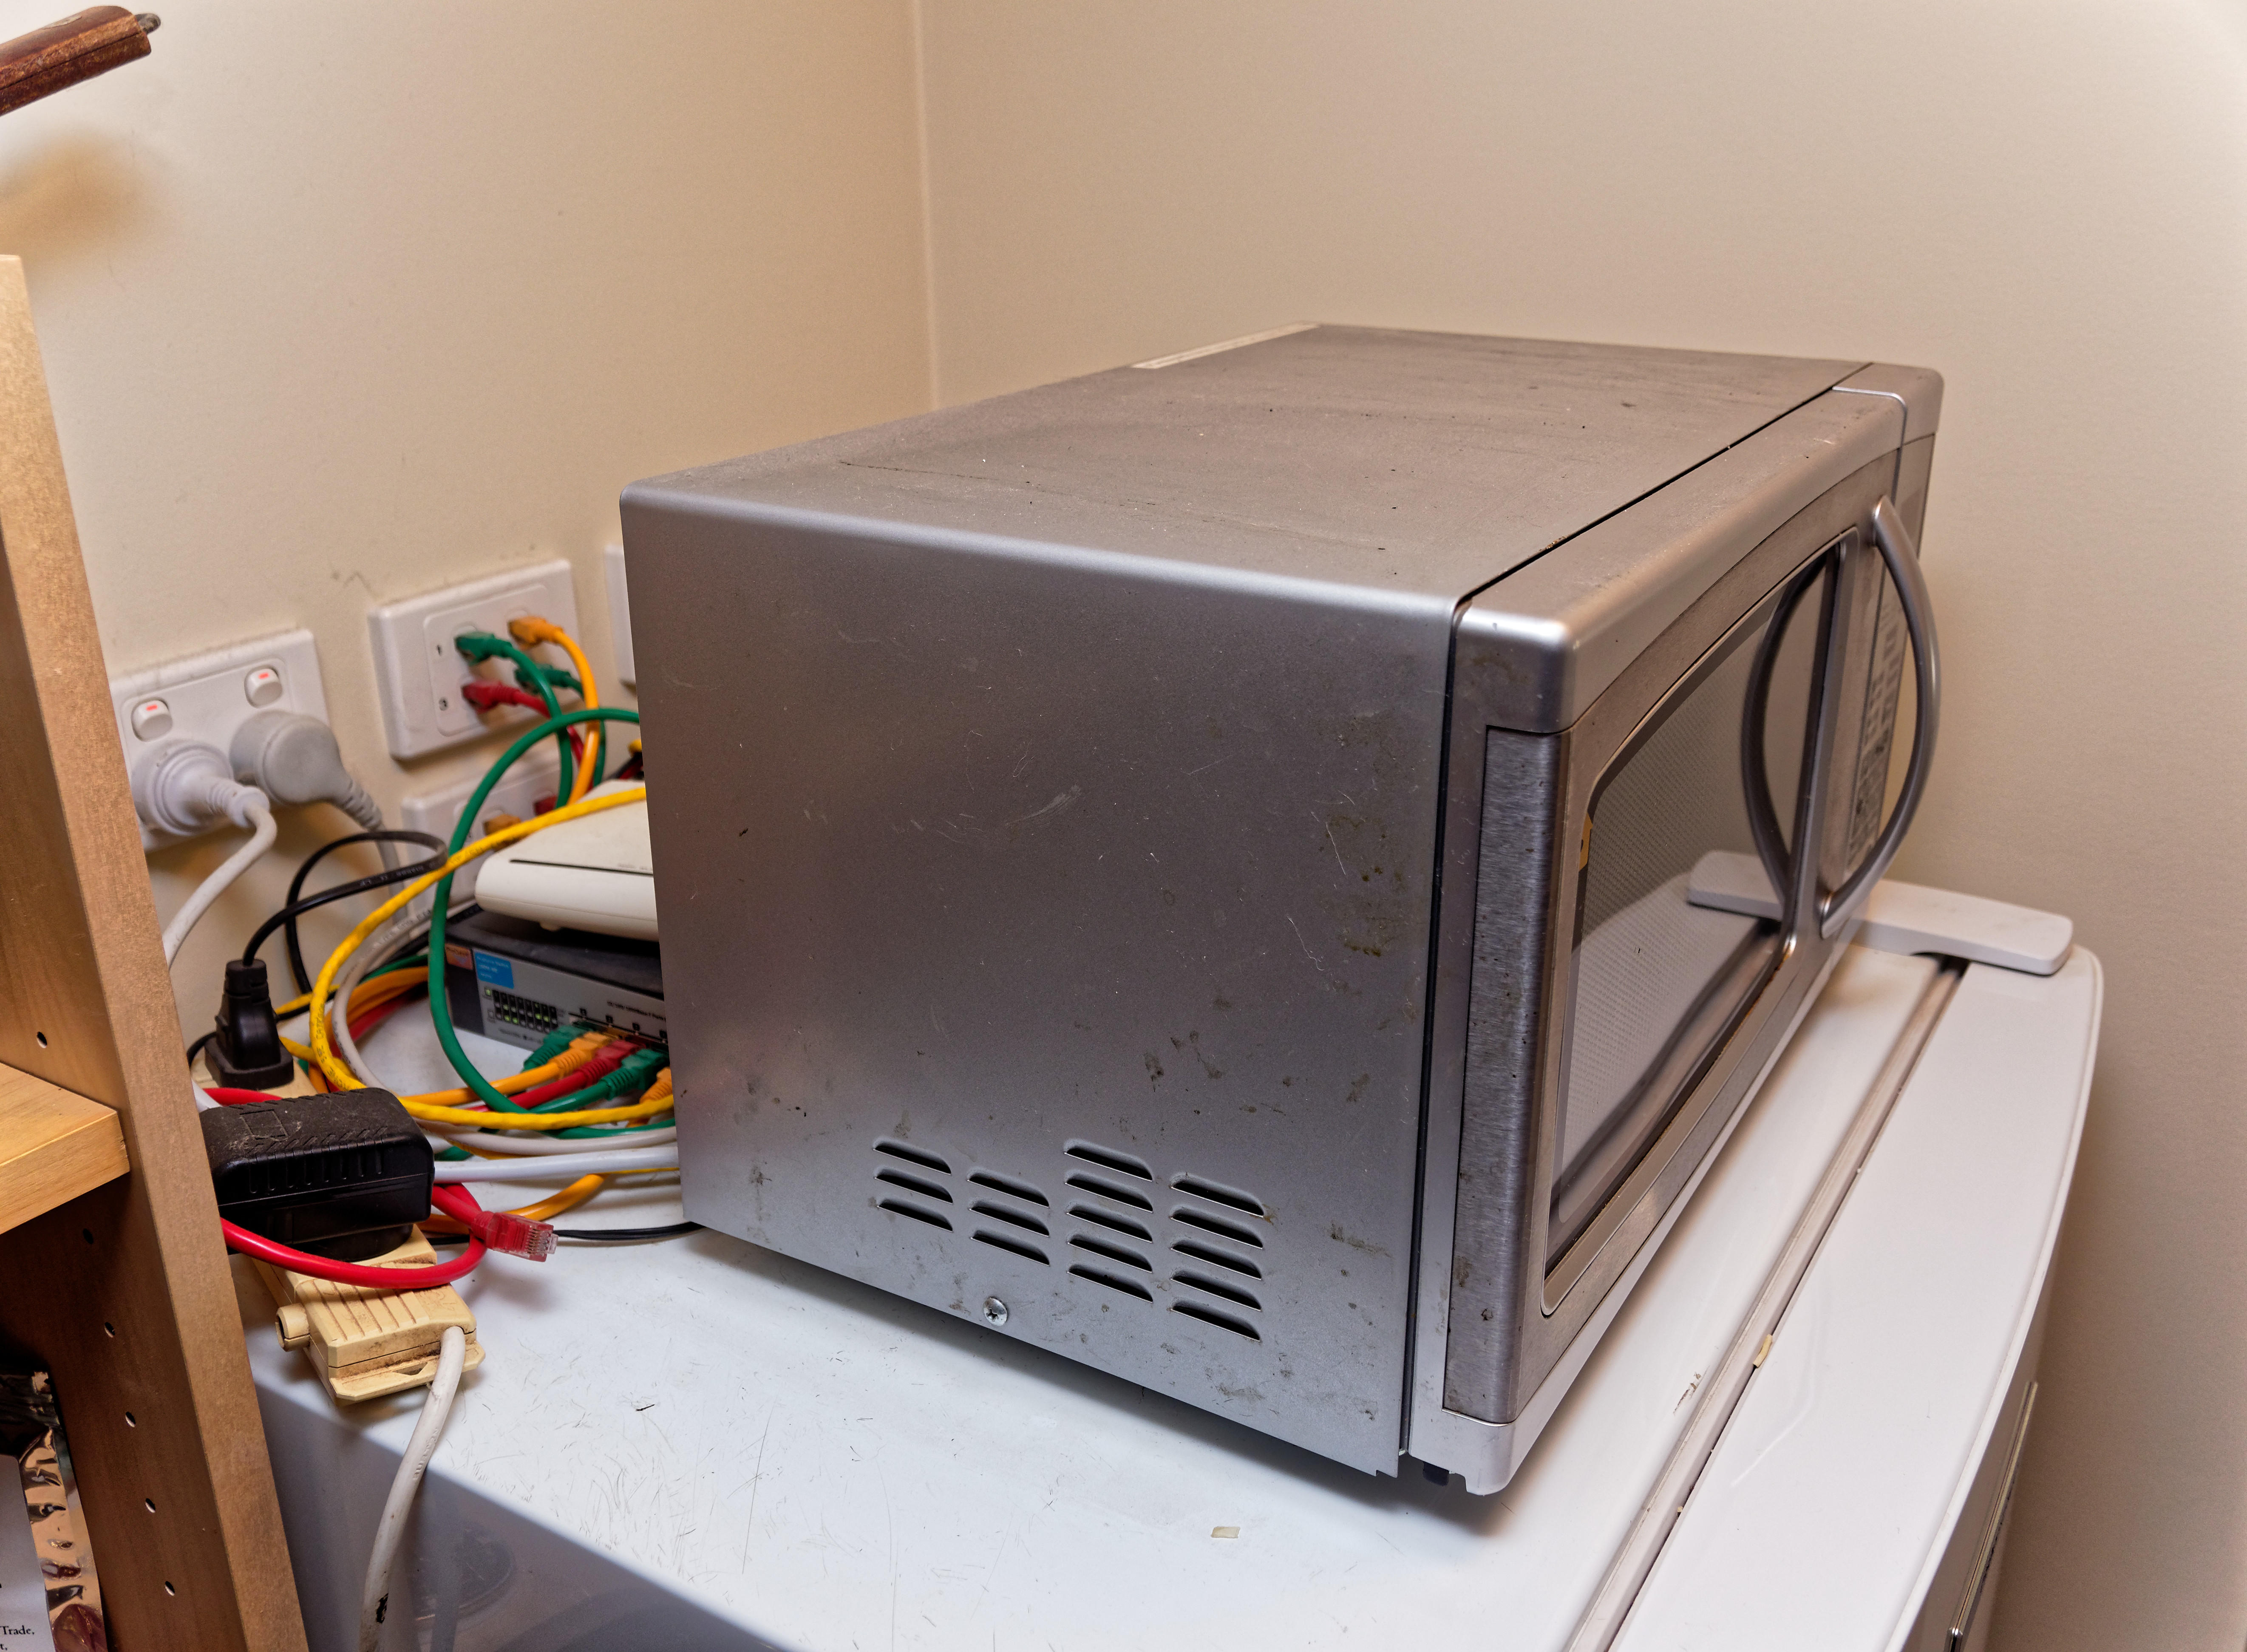 Microwave-802.11-2.jpeg